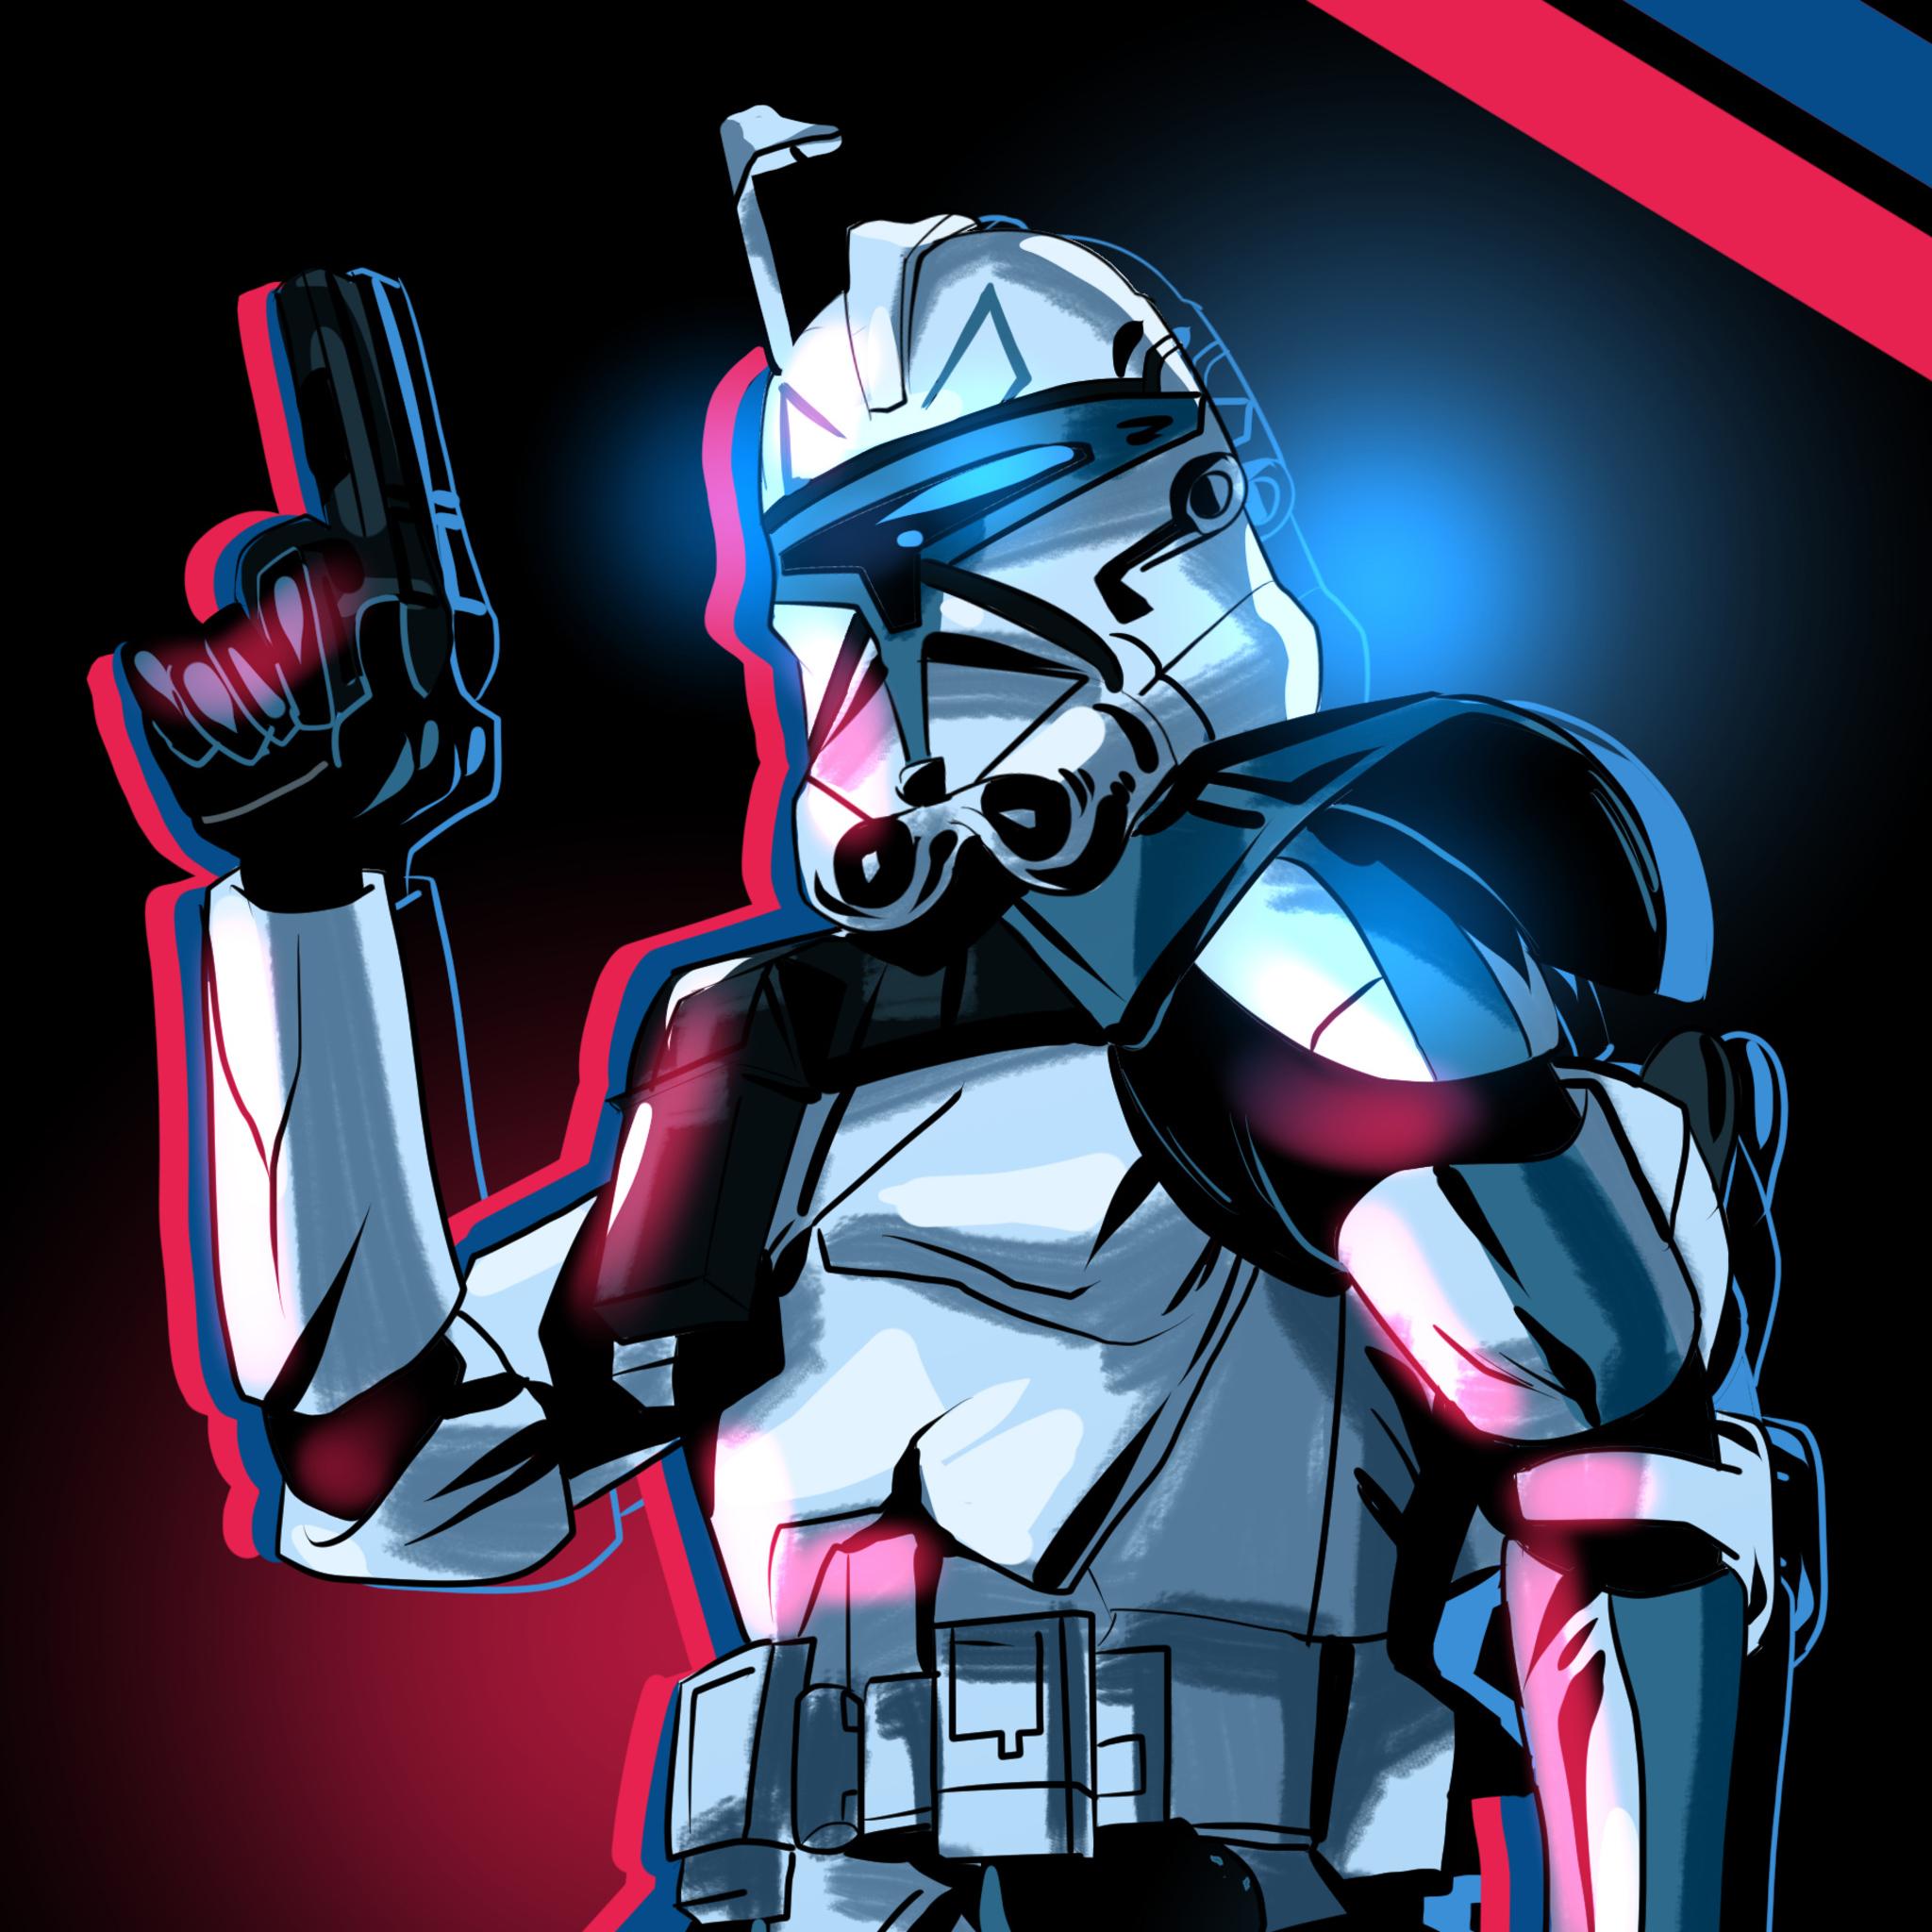 Star Wars Art Tablet Wallpaper Wallpaper 2048x2048 Wallpaper Teahub Io